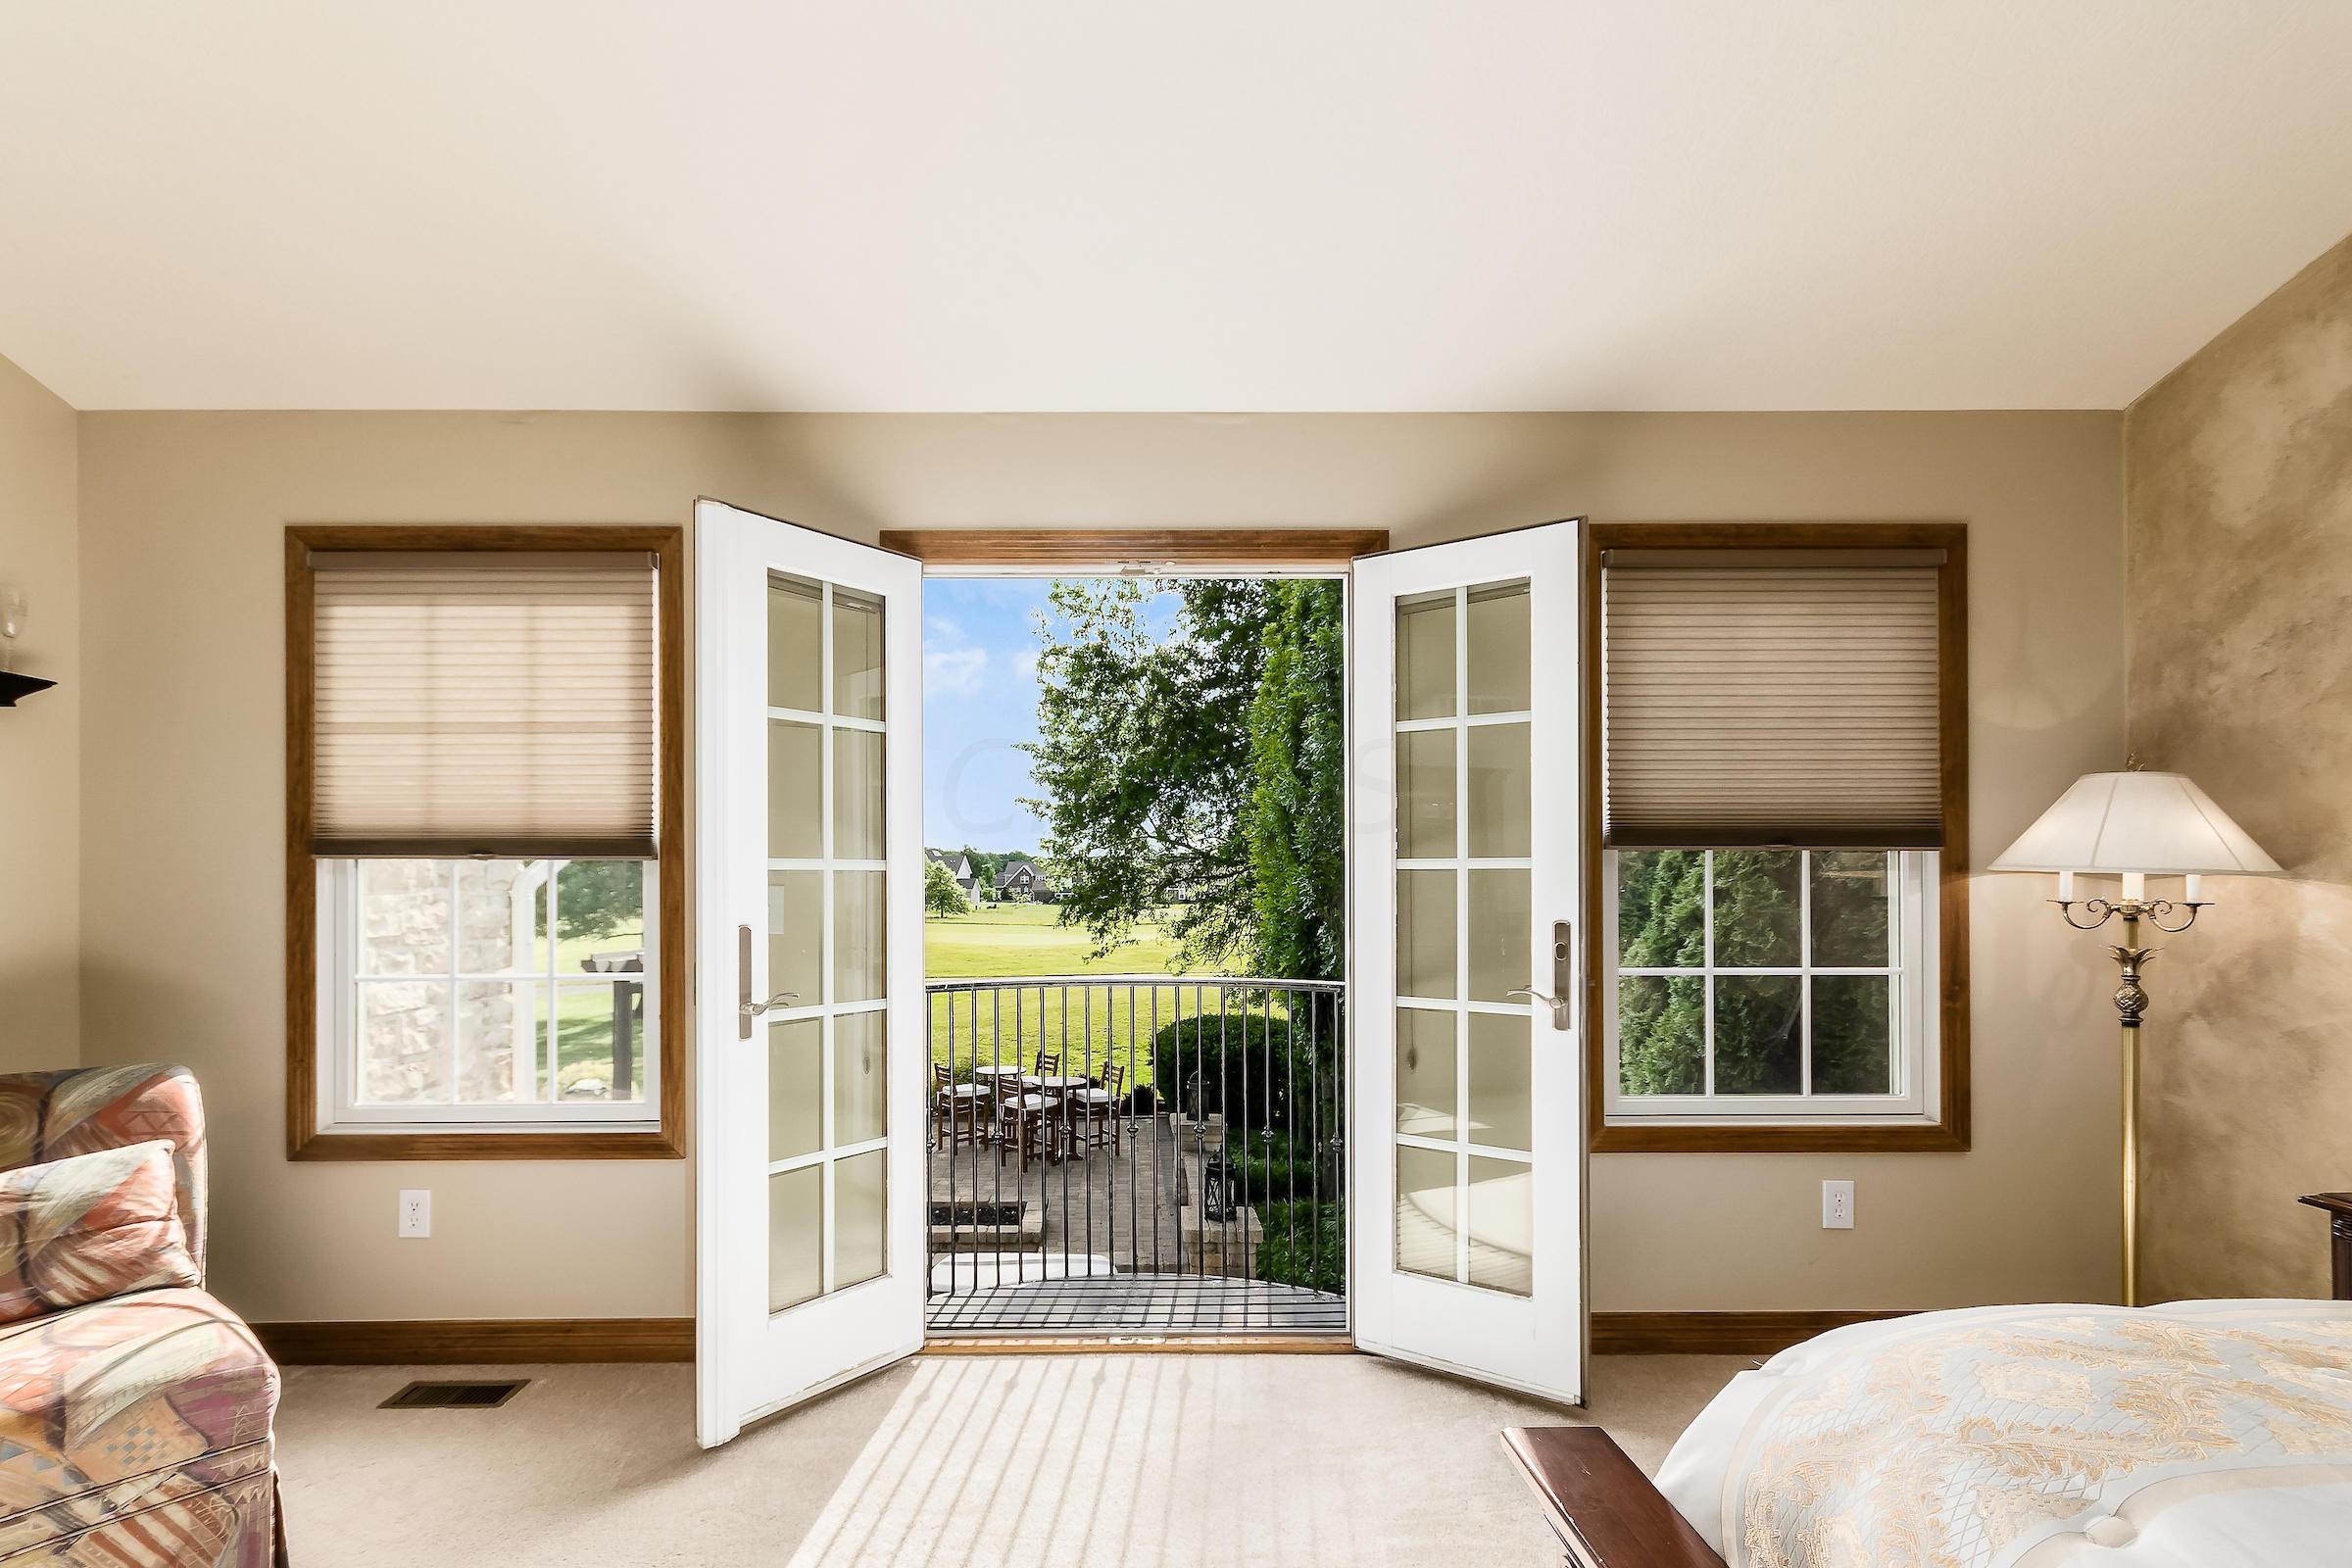 236 Tara Glen Drive, Delaware, Ohio 43015, 4 Bedrooms Bedrooms, ,4 BathroomsBathrooms,Residential,For Sale,Tara Glen,220019401